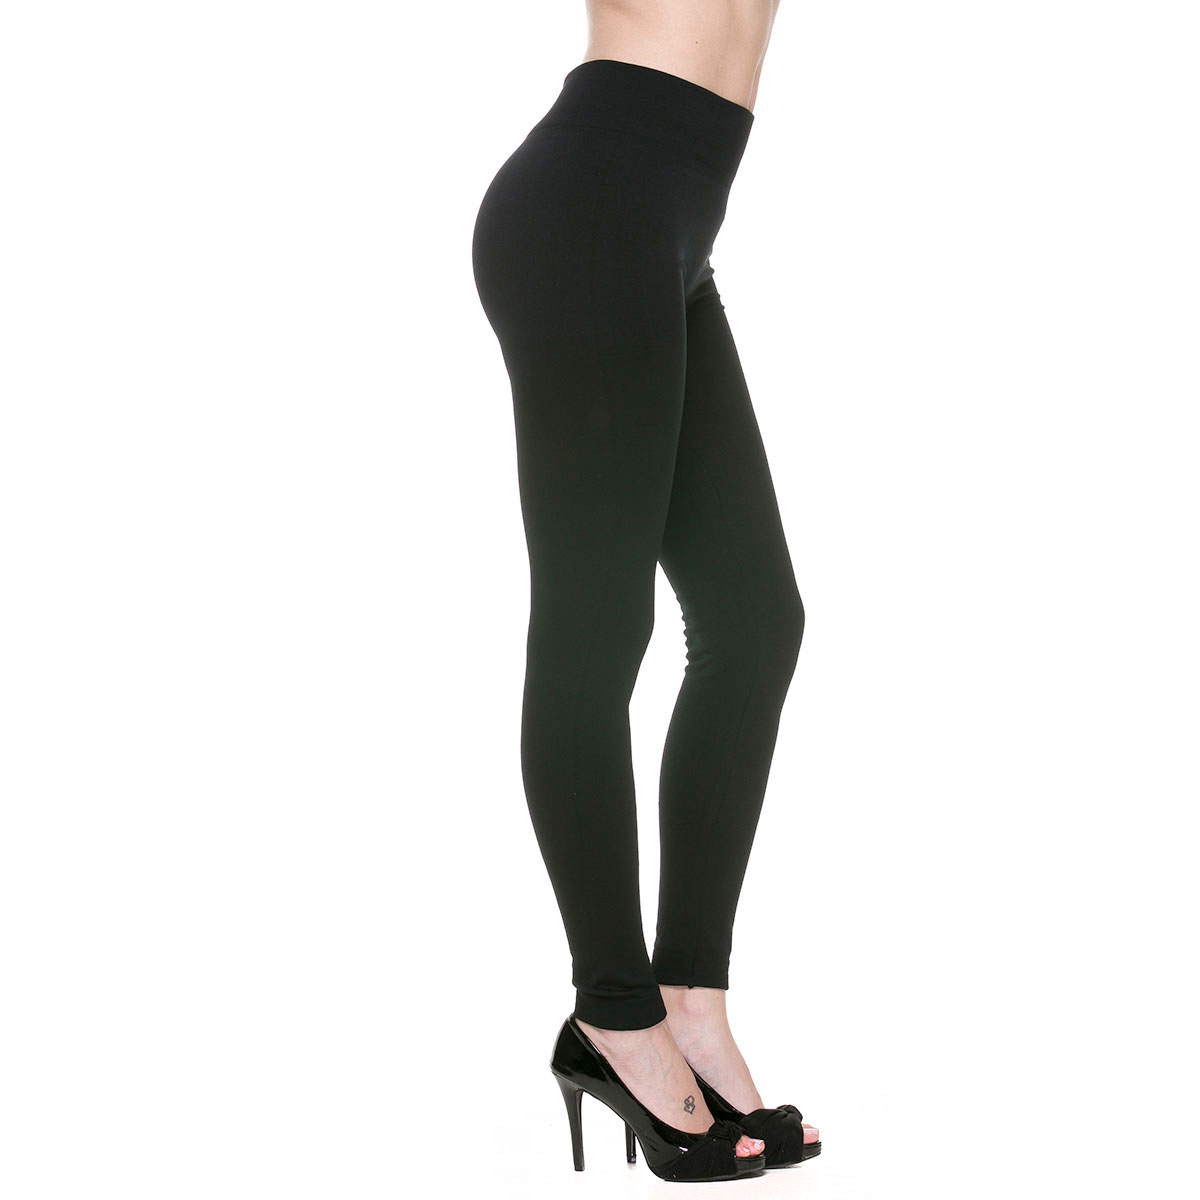 Winter Leggings - Fleece and Fur Lining - Solid Black - Fleece Lined Leggings 9000 PLUS